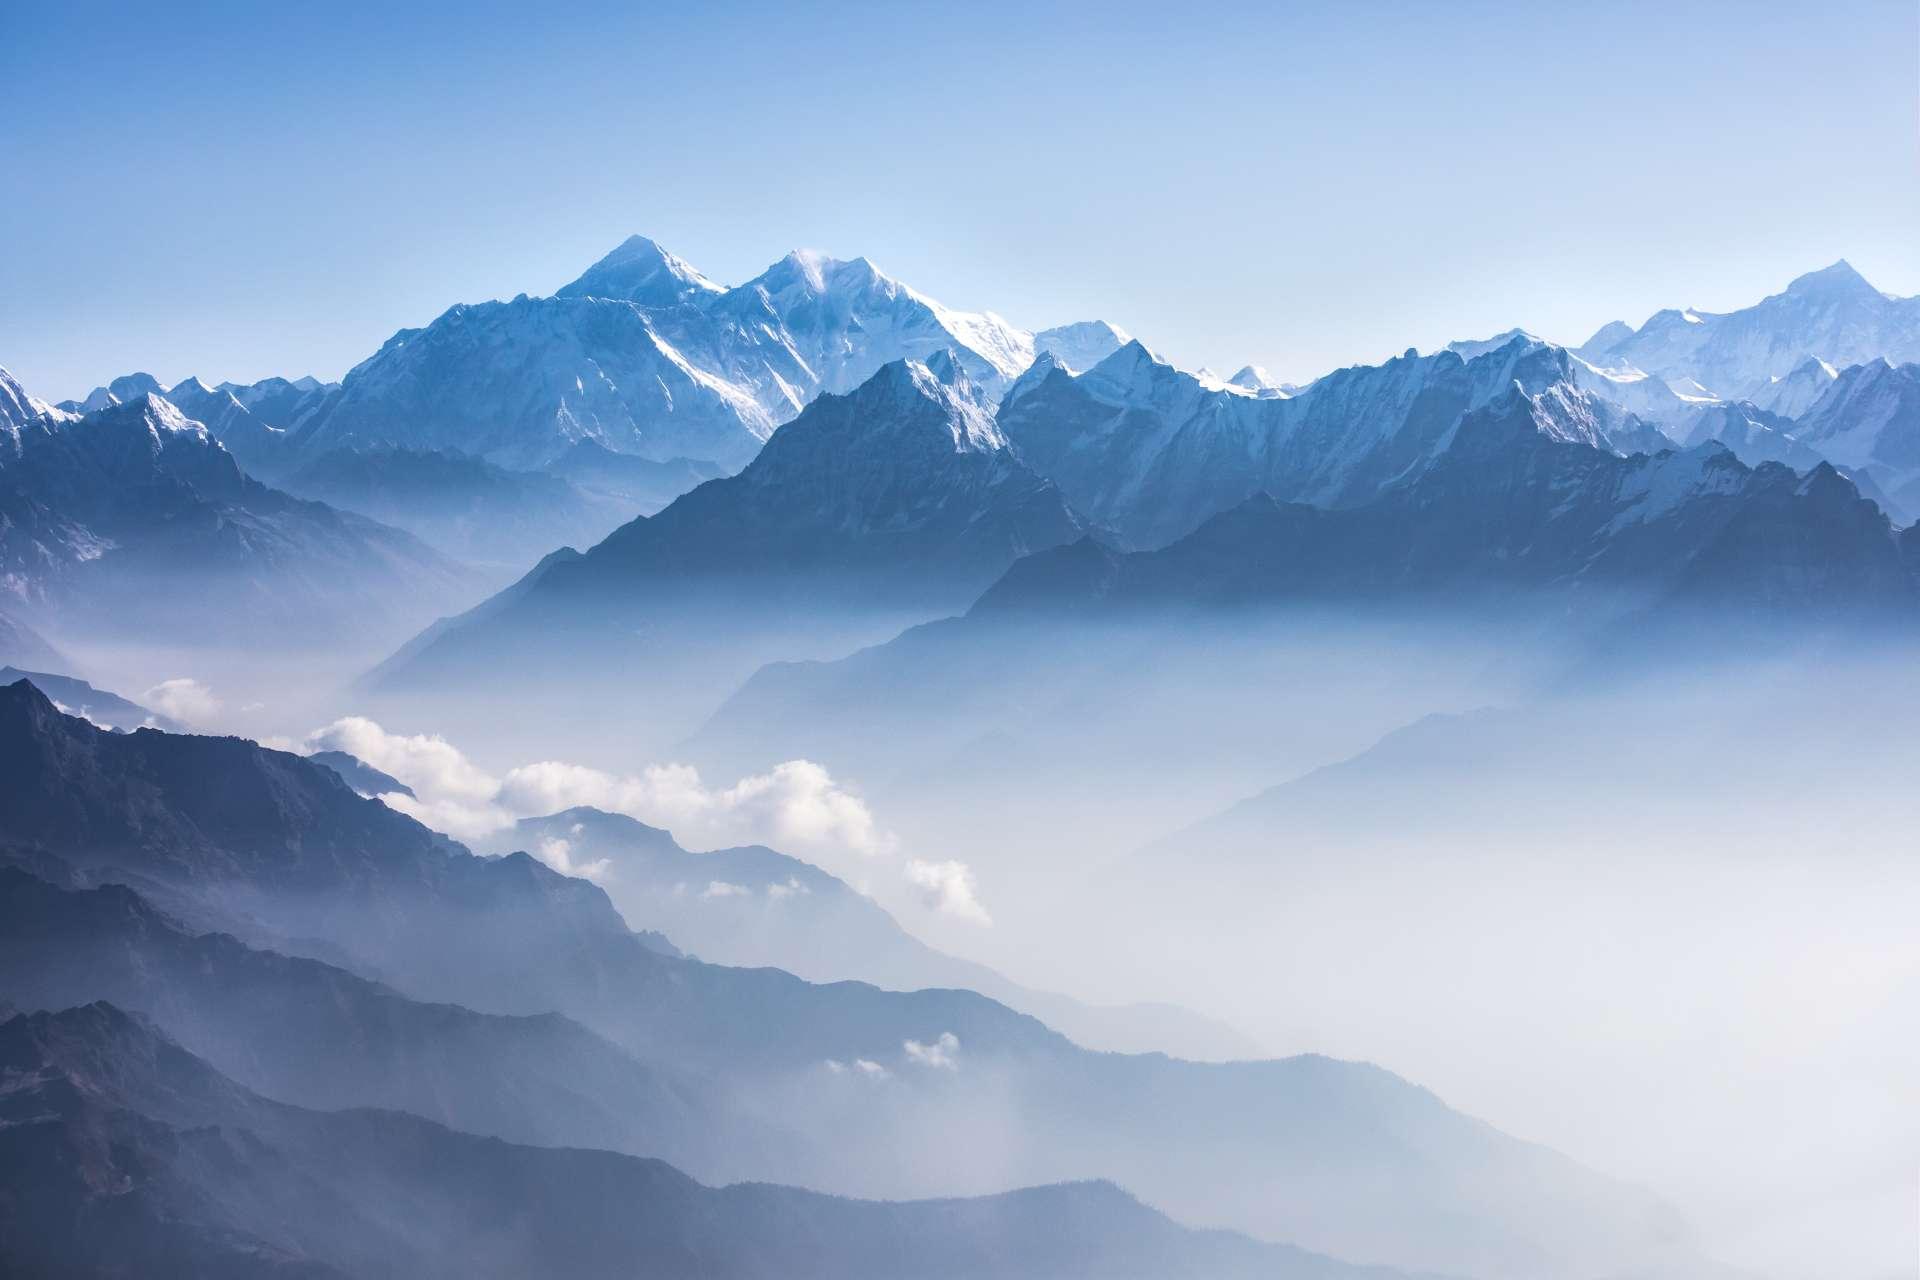 Custom-Travel-Planner-Network-Nepal-Daylight-view-Mt-Everest-